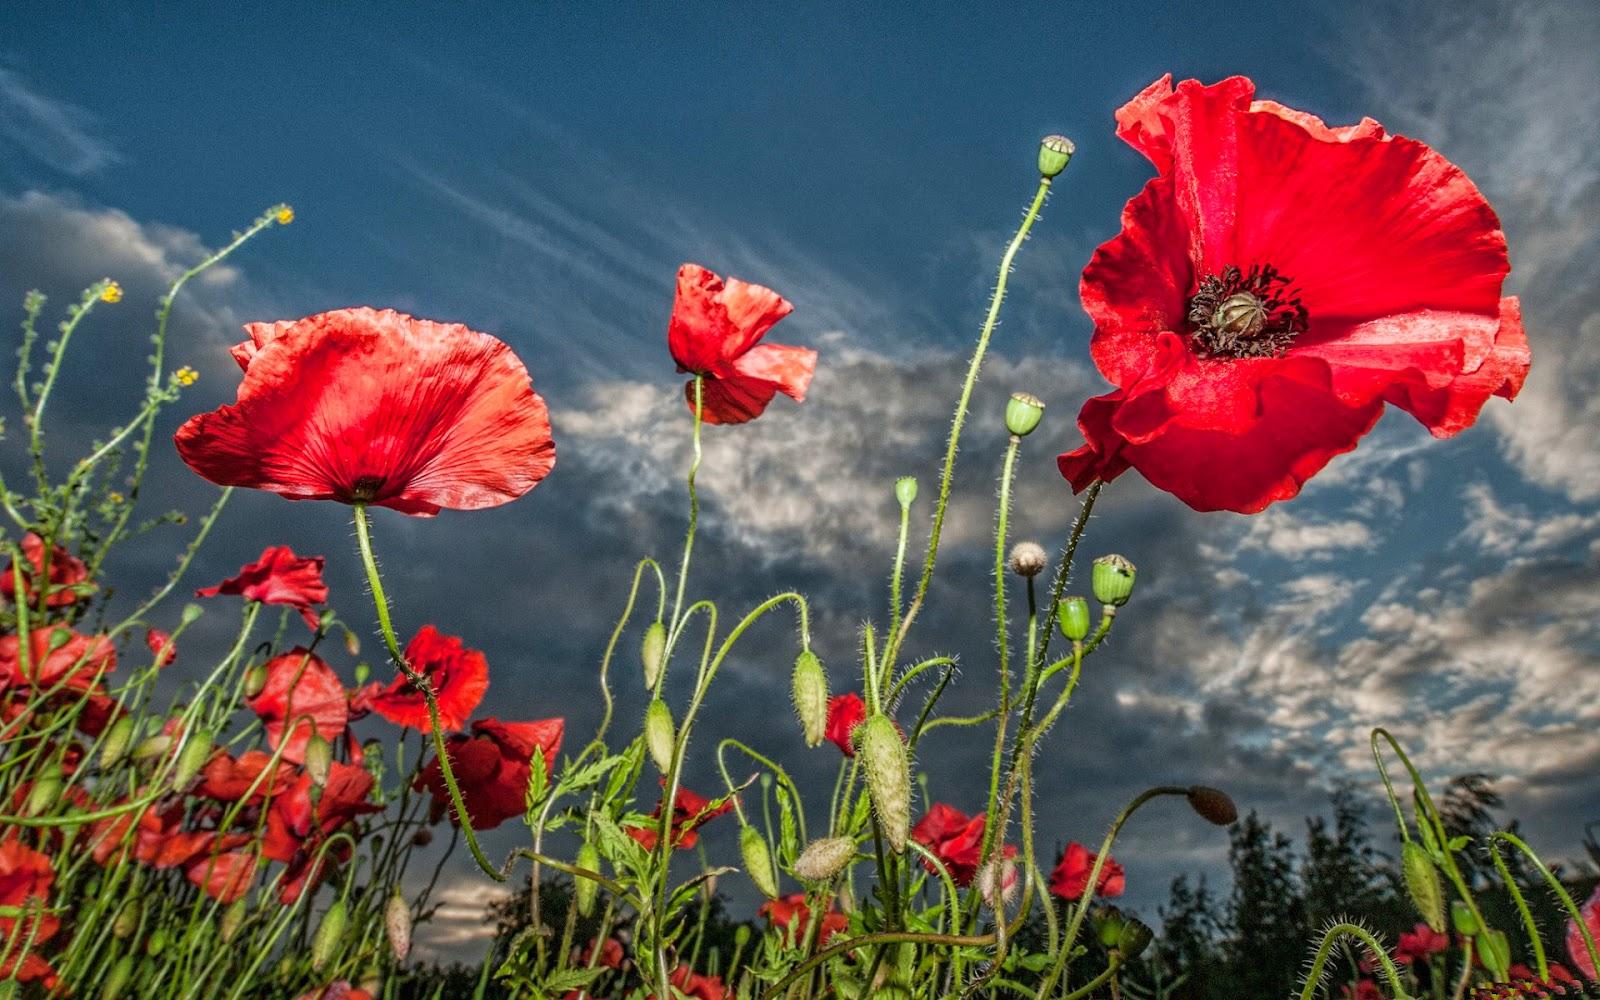 Iphone 5 Wallpaper Floral Red Poppy Flower Wallpaper